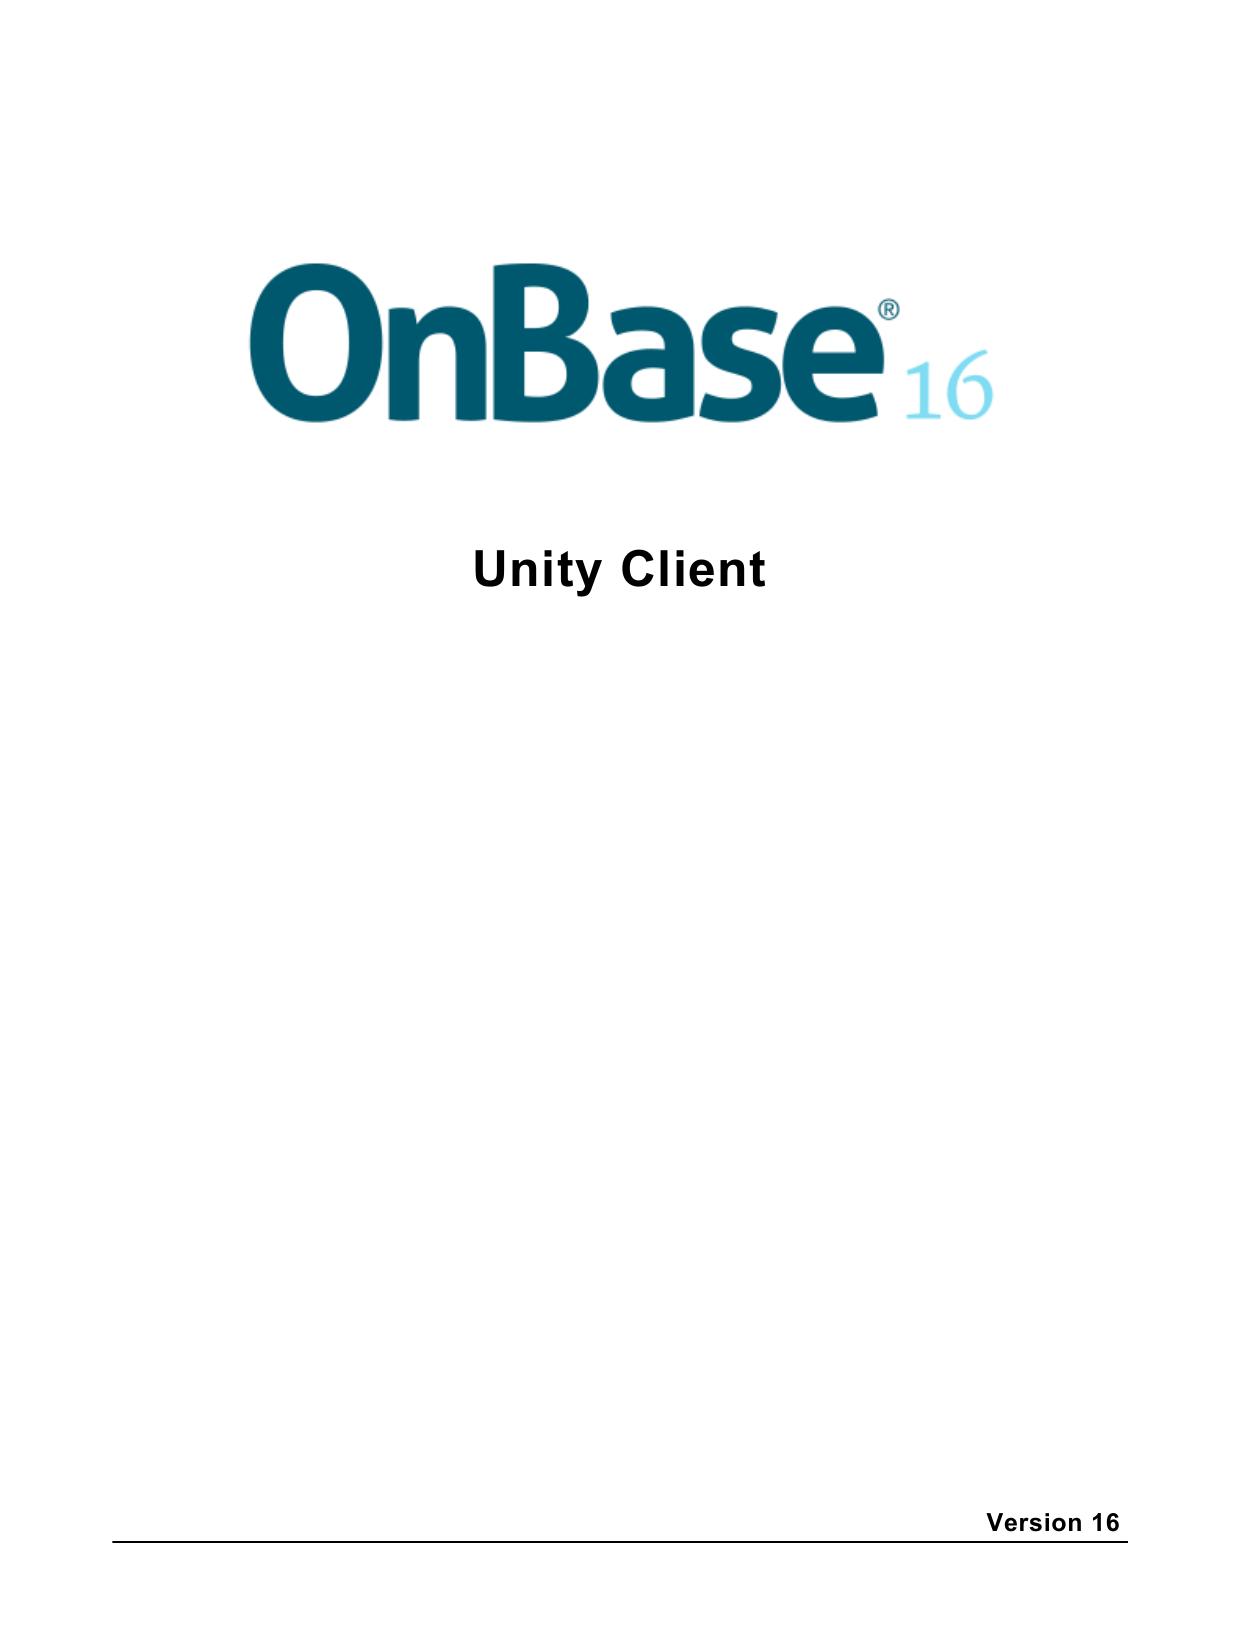 Onbase 16 Unity Client User Guide | manualzz com